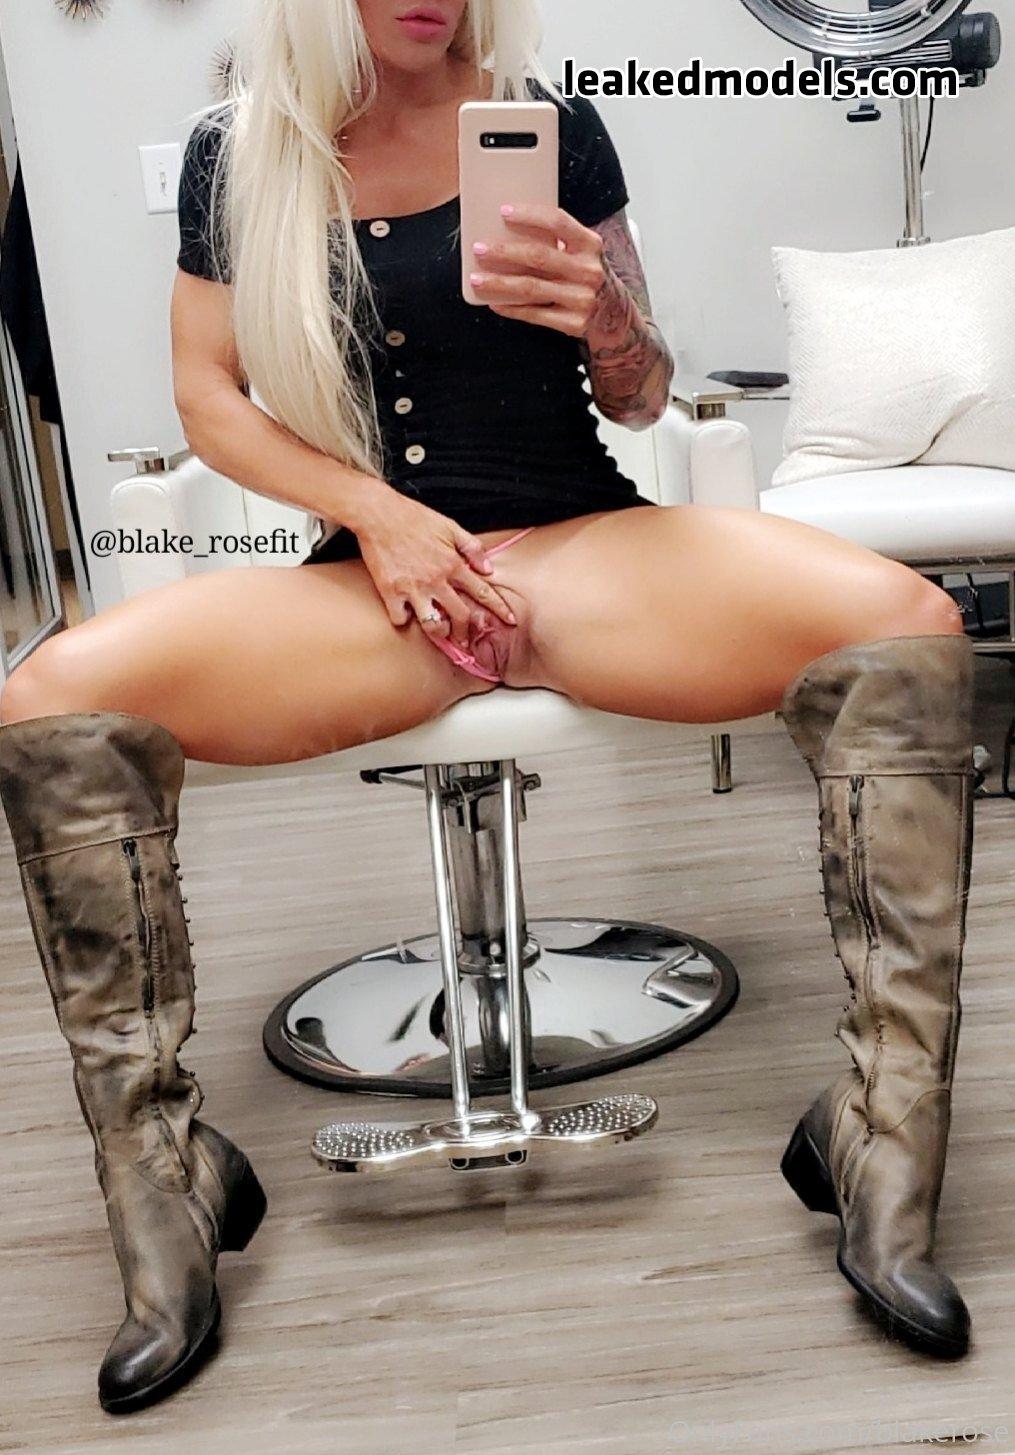 Blake Rose – Blakerosefit OnlyFans Nude Leaks (30 Photos)